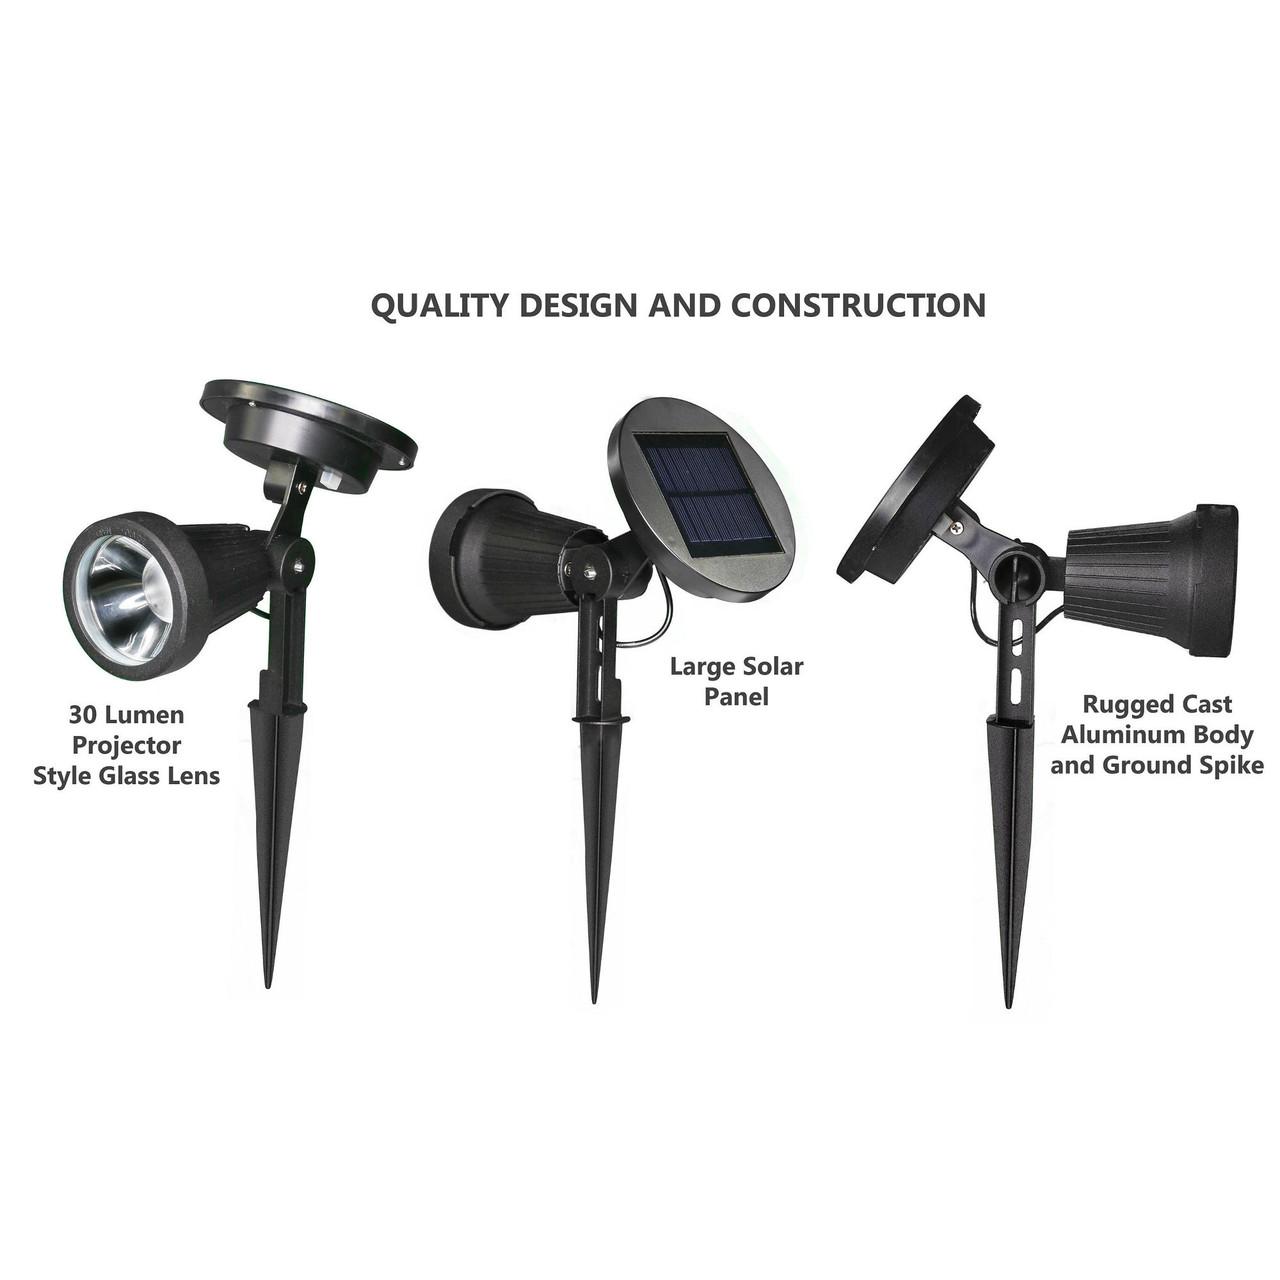 Classy Caps High Performance Spotlight Features